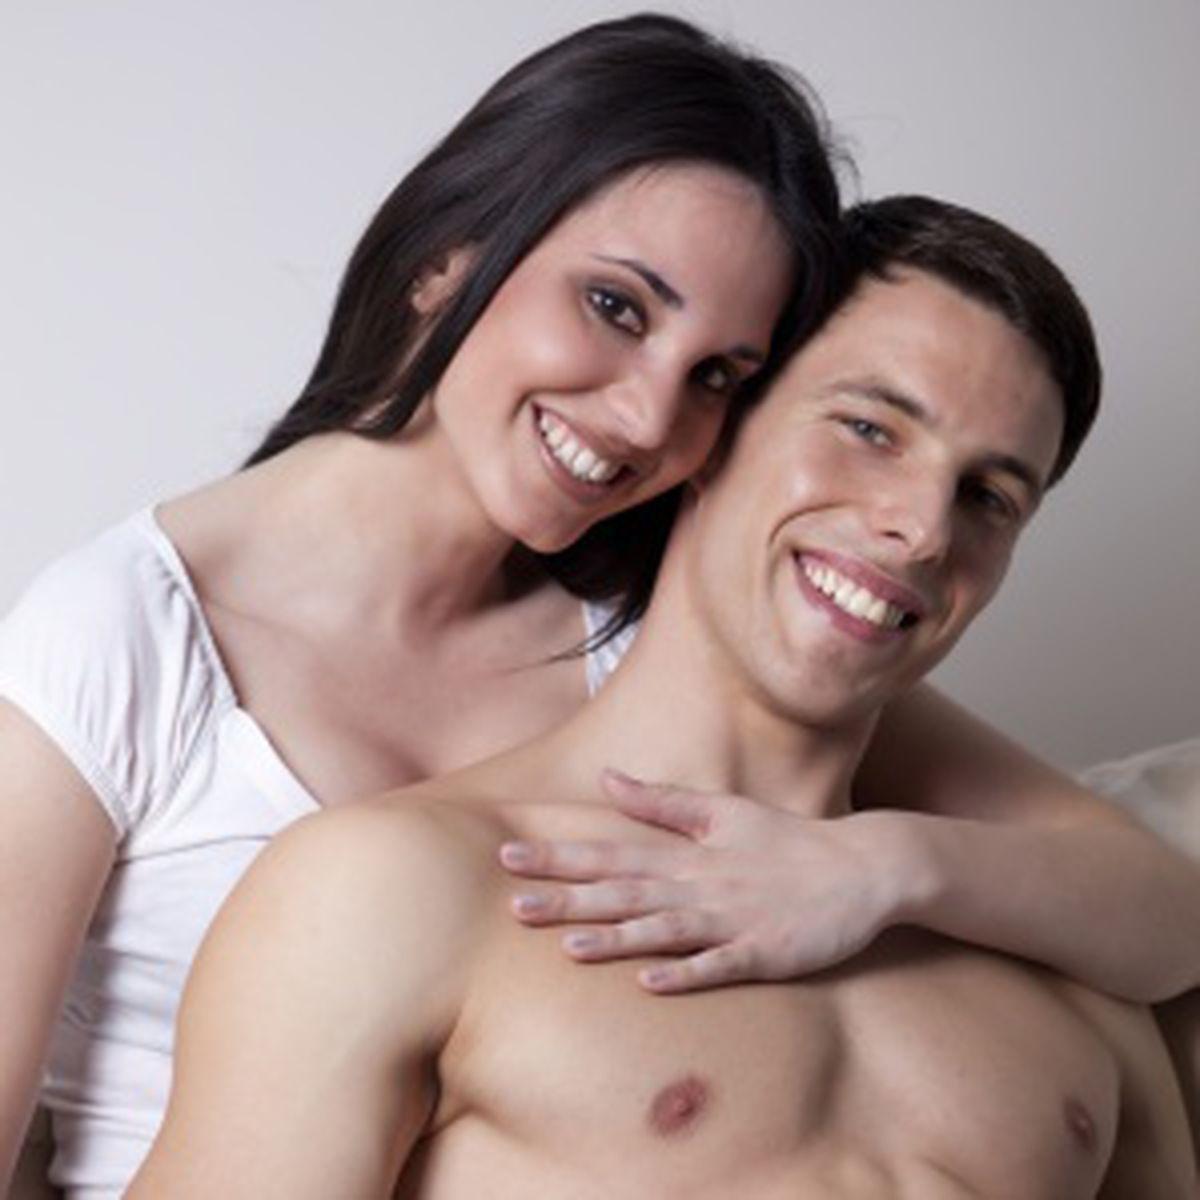 11 mituri despre sanatatea barbatilor | go2dent.ro